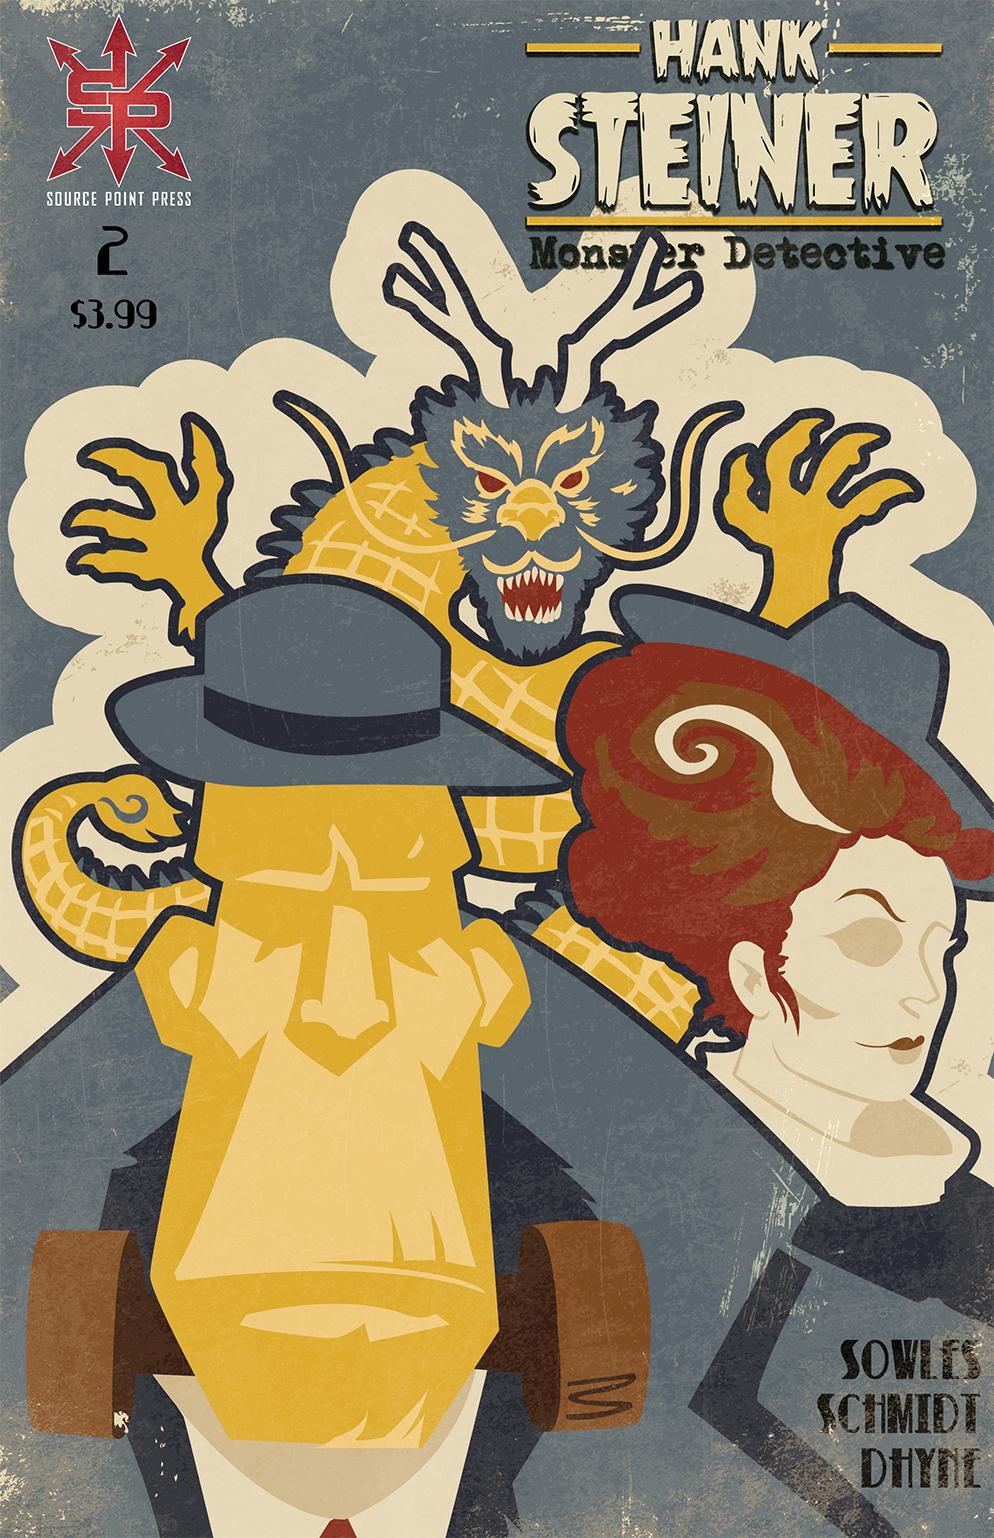 Hank Steiner: Monster Detective #2 from Source Point Press